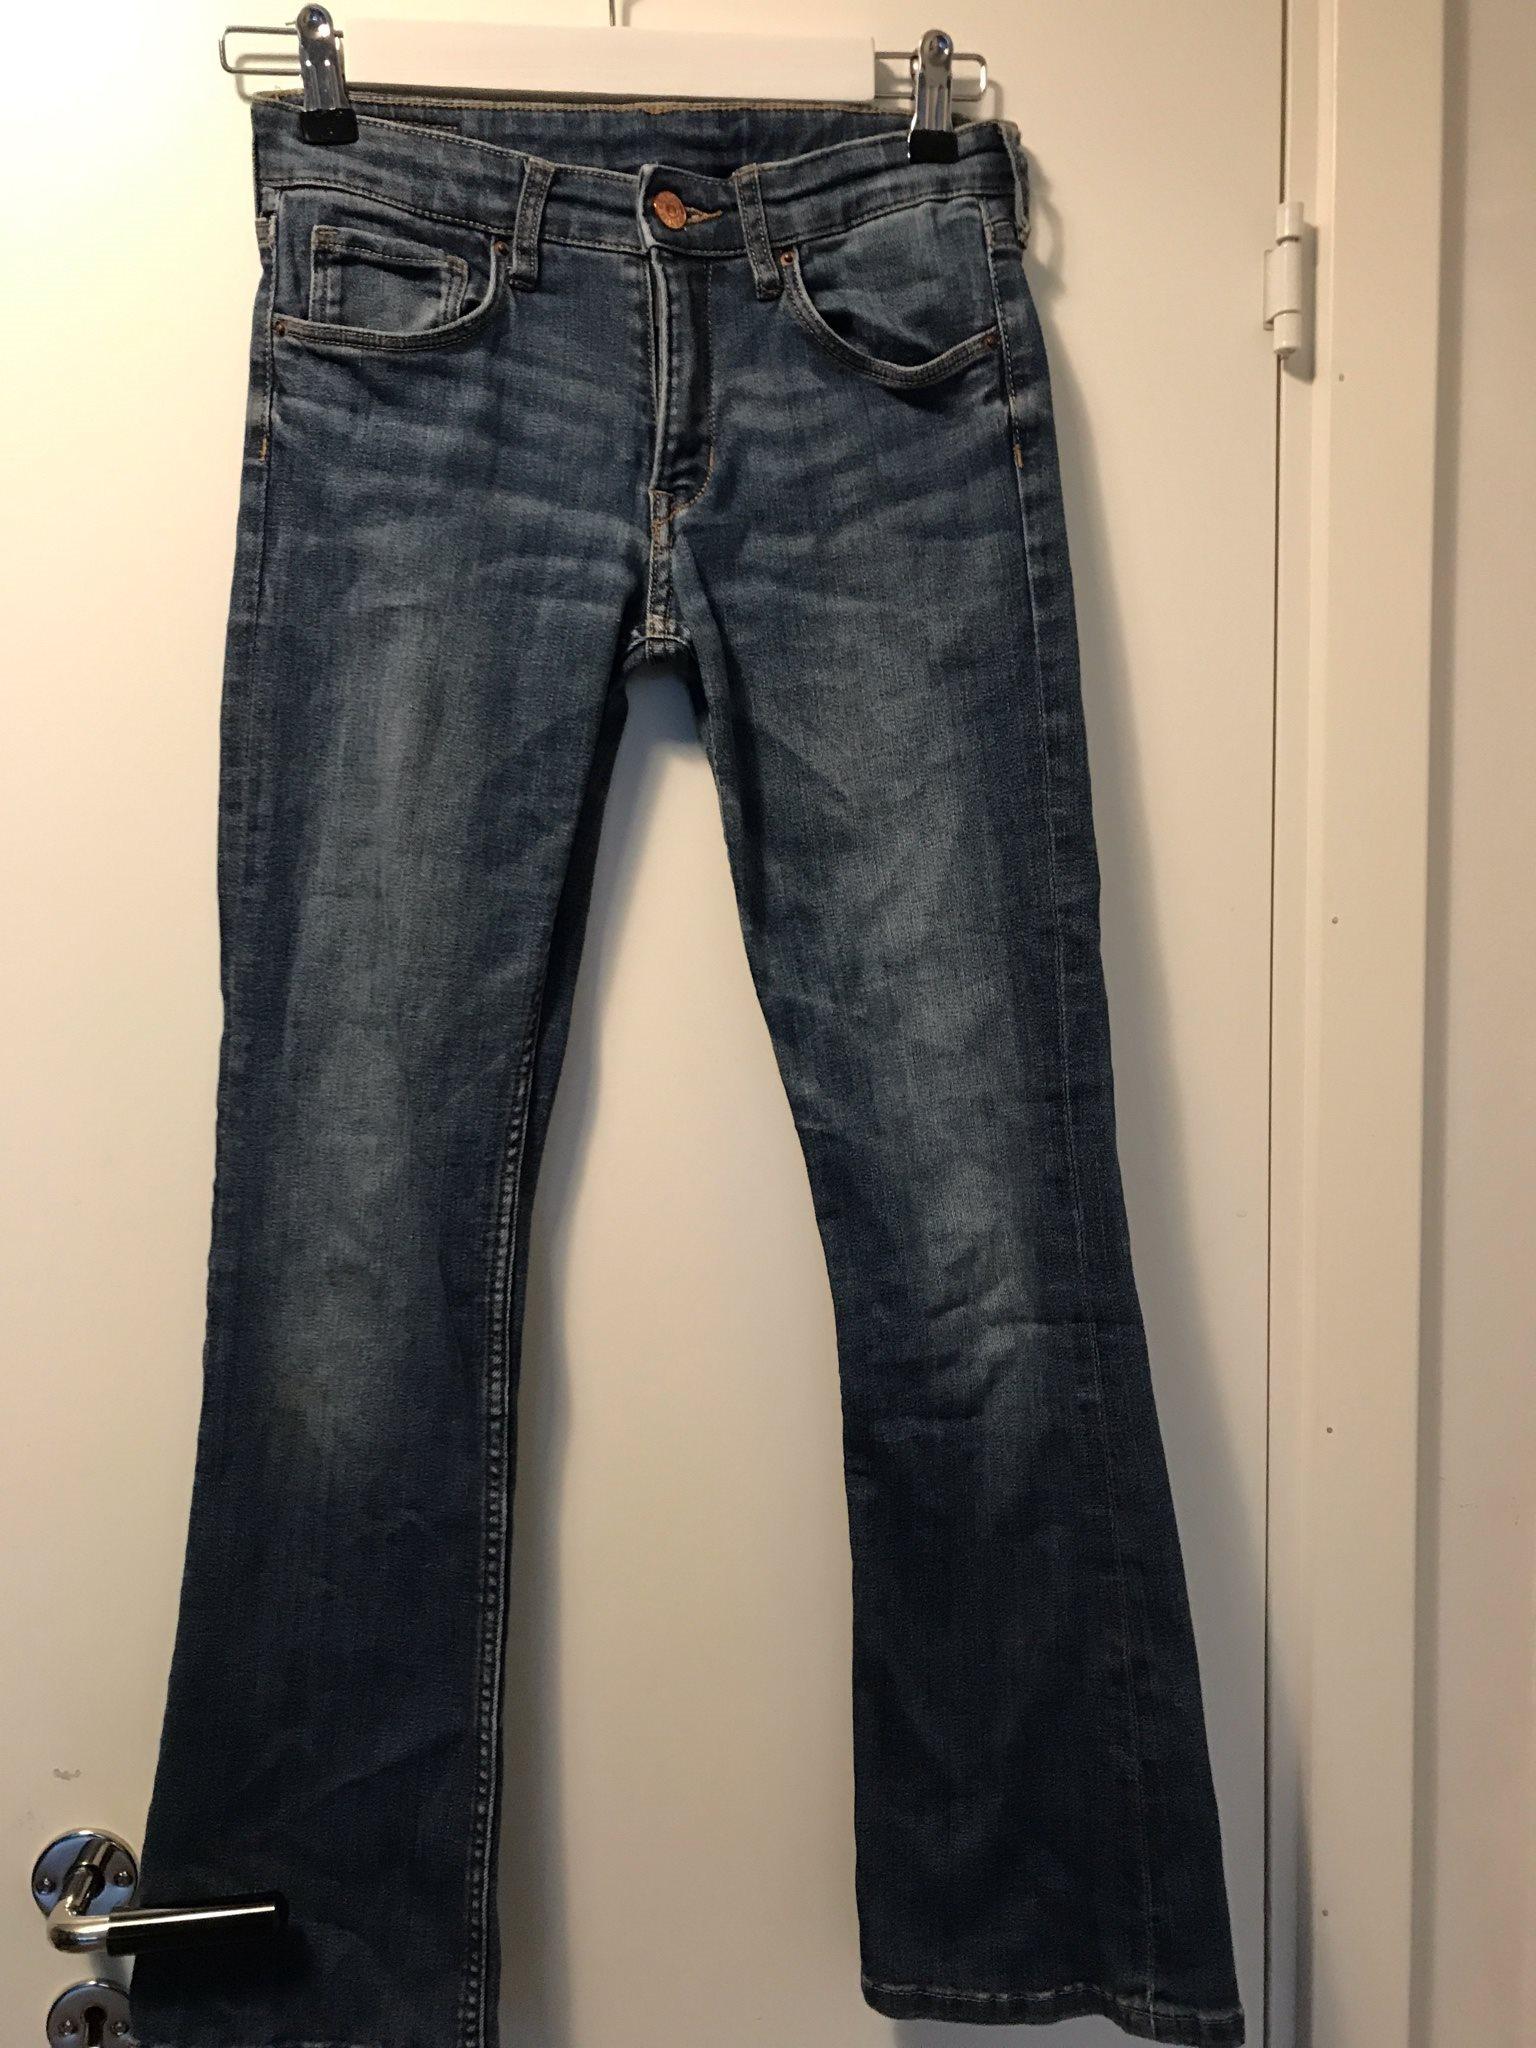 Jeans från H M acdc2ba525f3c